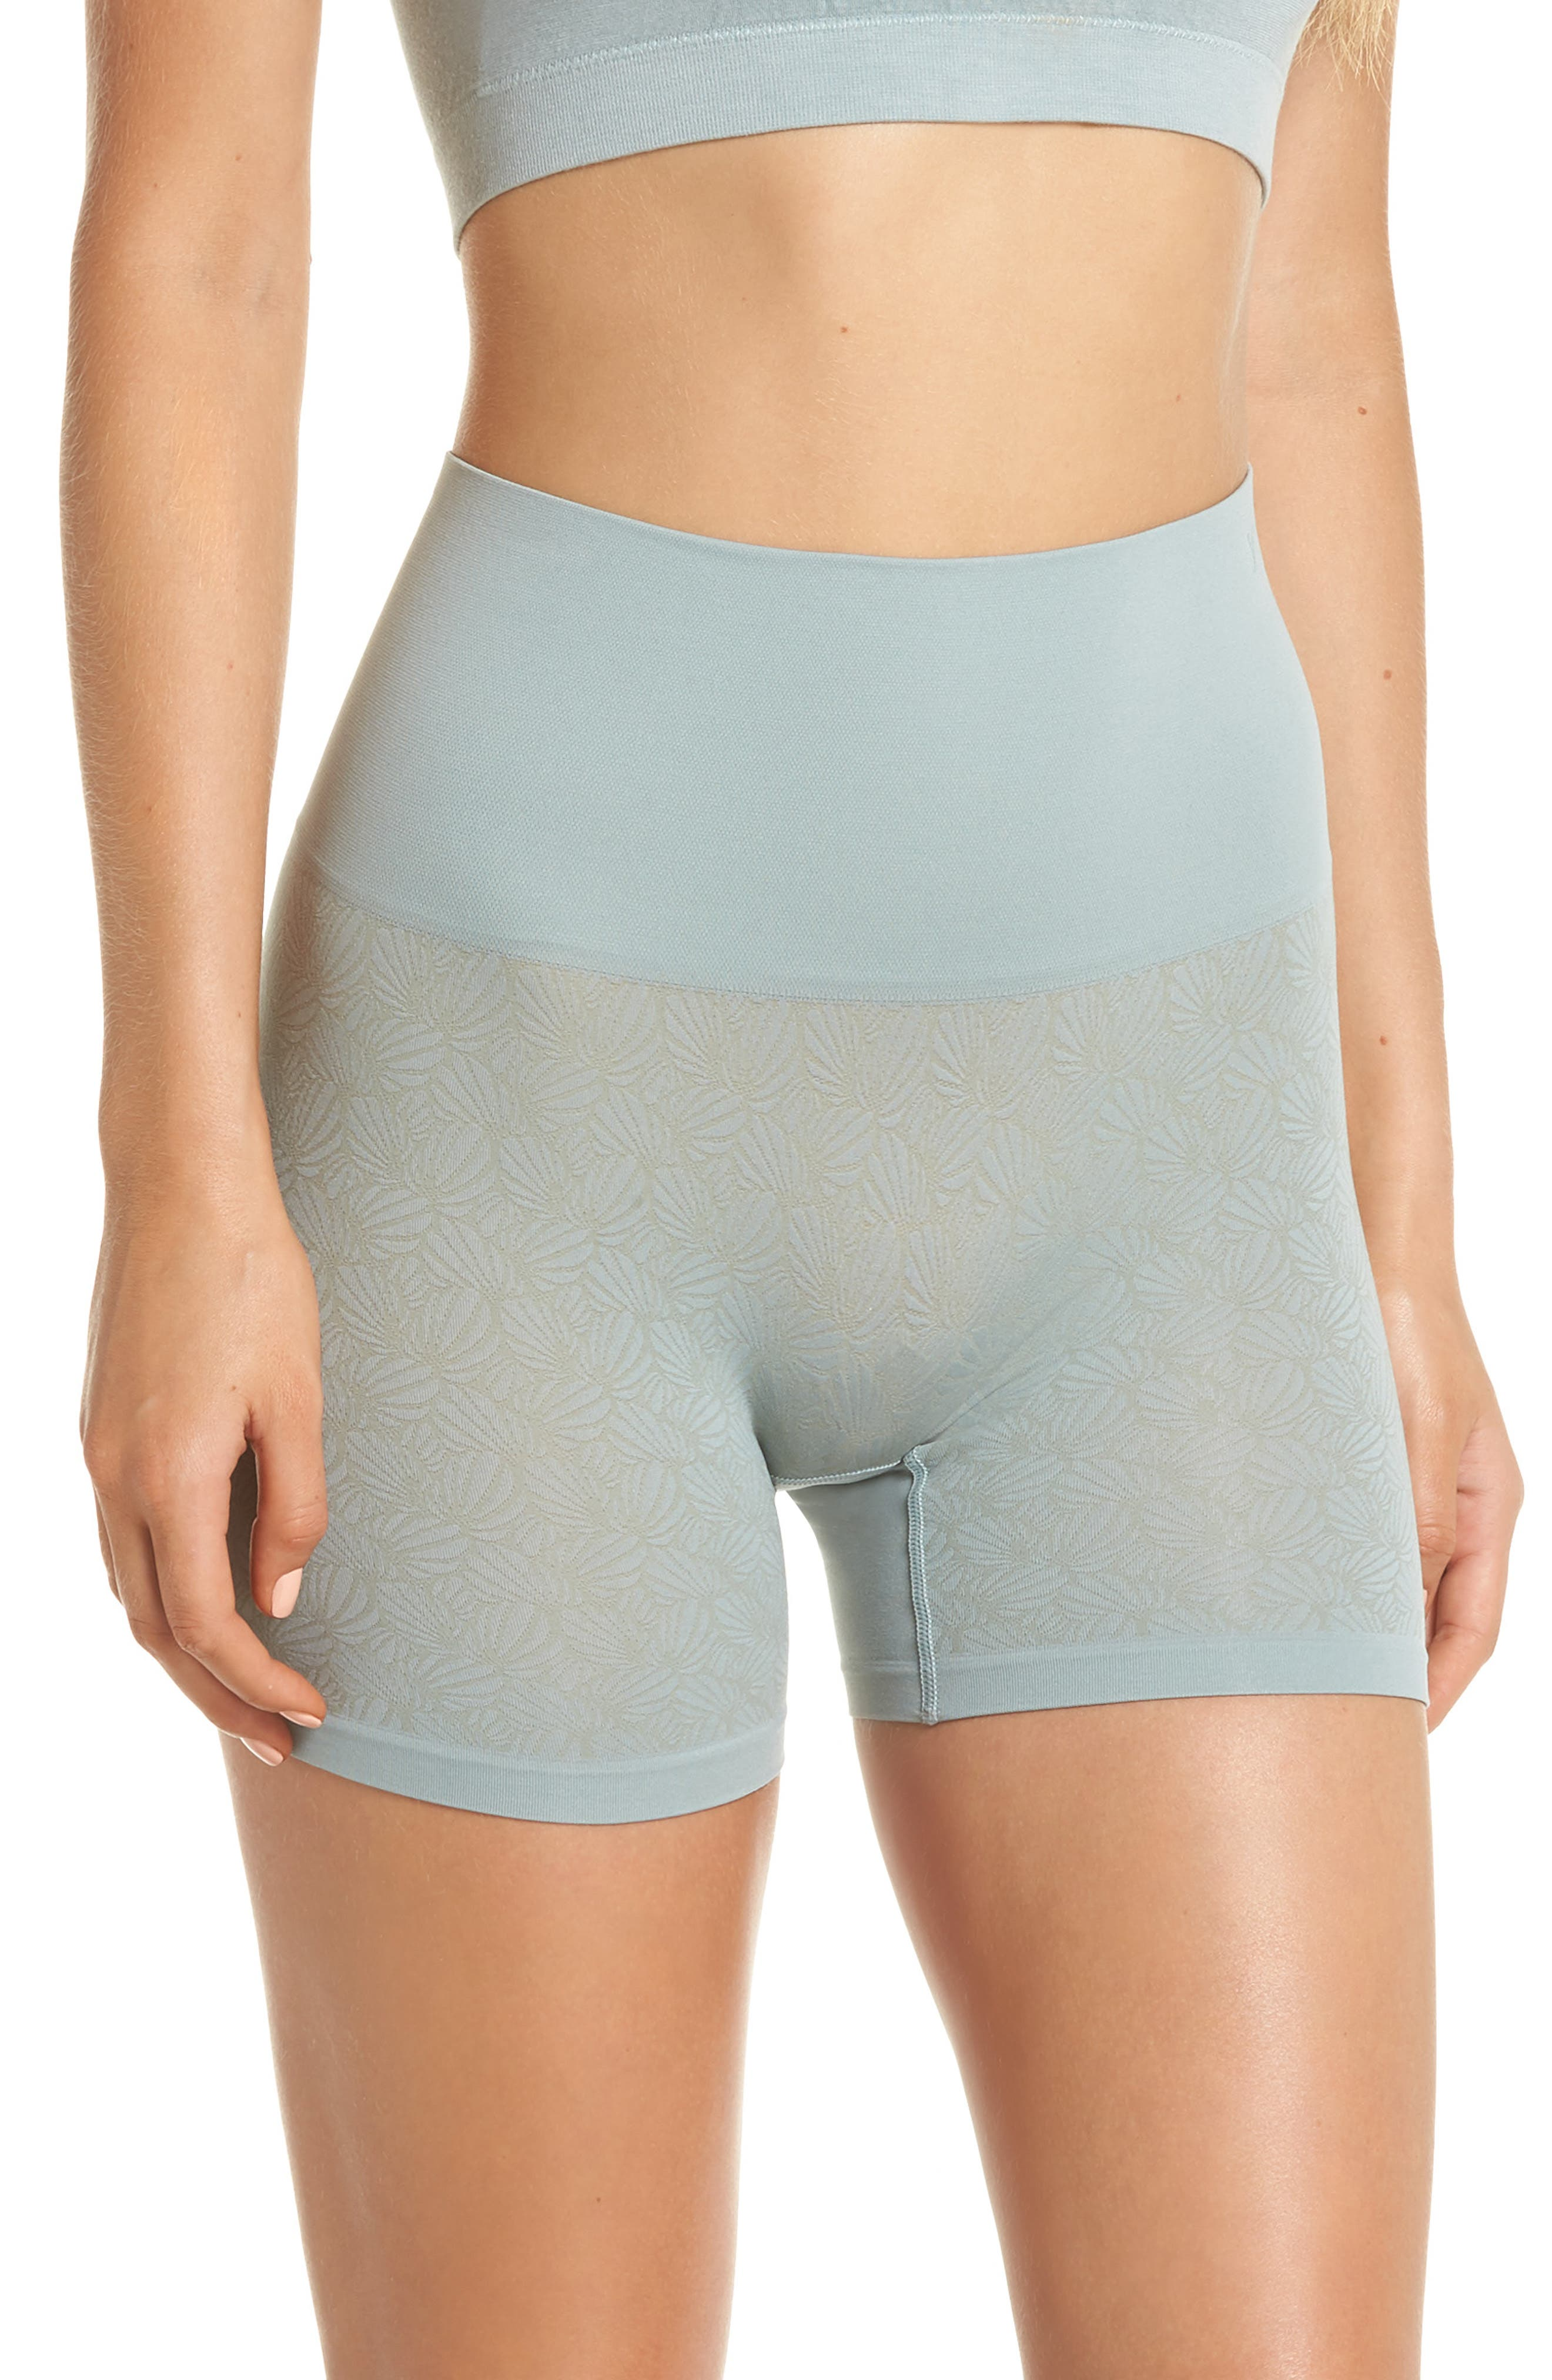 Ultralight Seamless Shaping Shorts,                         Main,                         color, SILVER BLUE